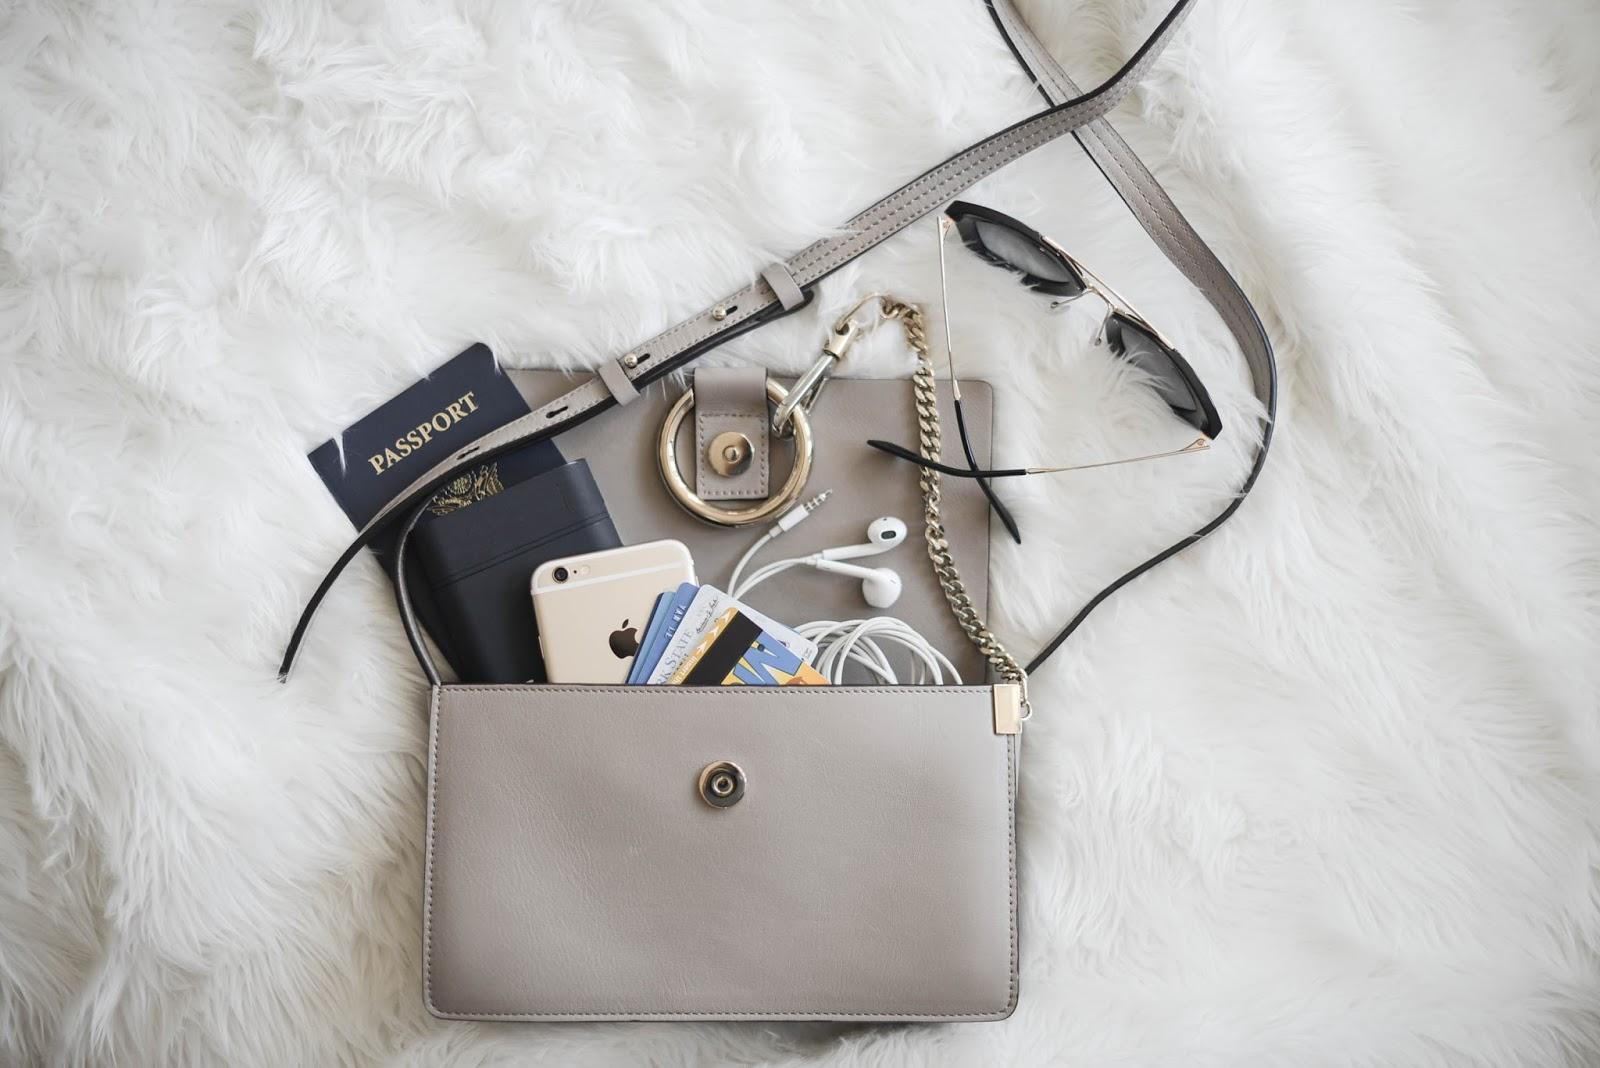 the best purse - Chloe Faye Small Motty Grey